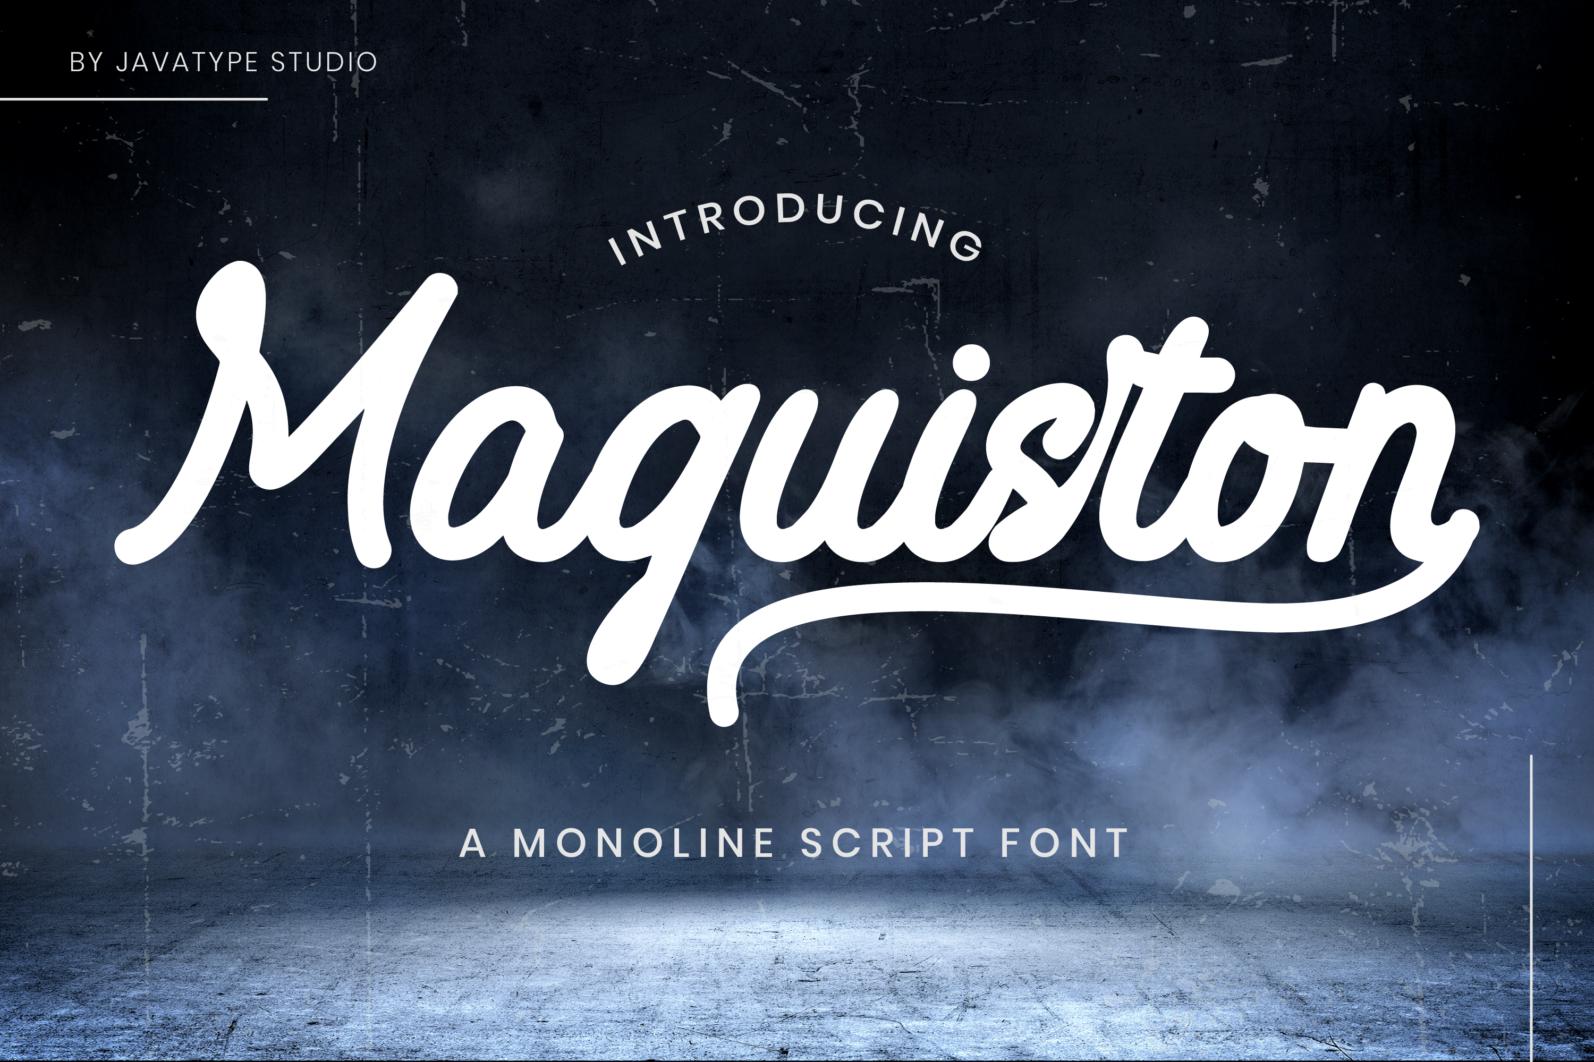 Maguiston a monoline script font - 01 preview1 -